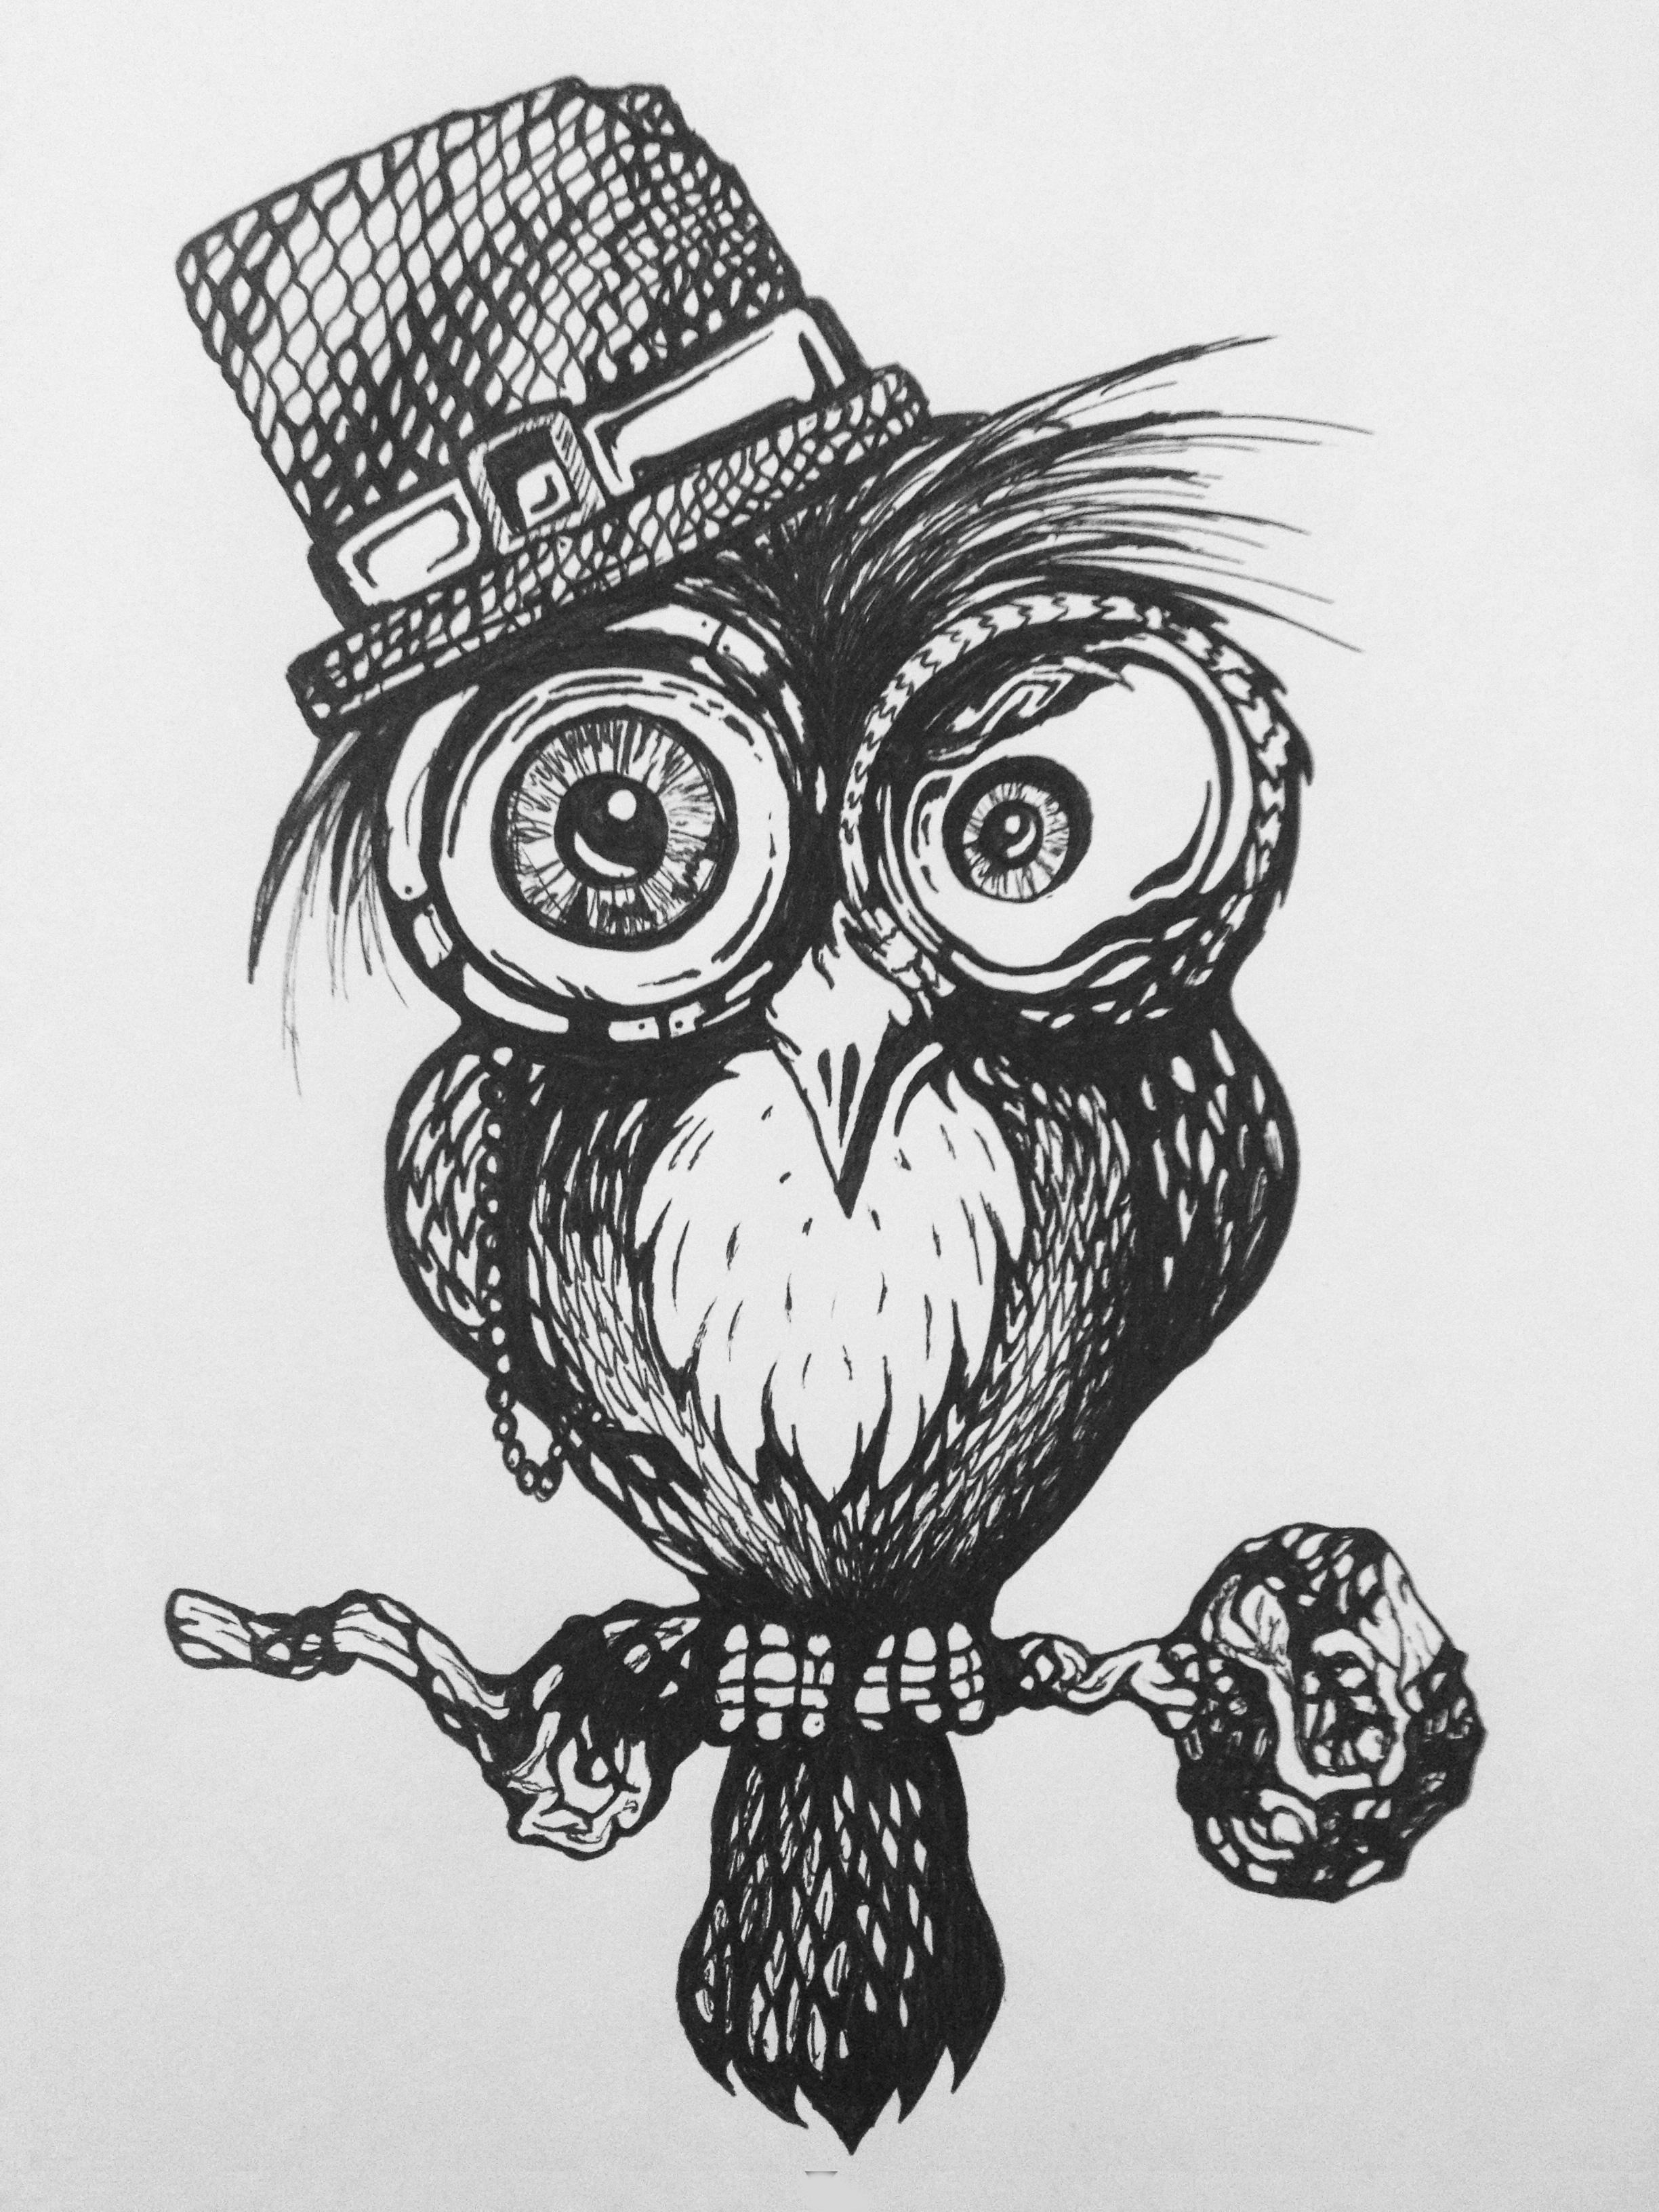 Sketchbook - TUL Gel Pen